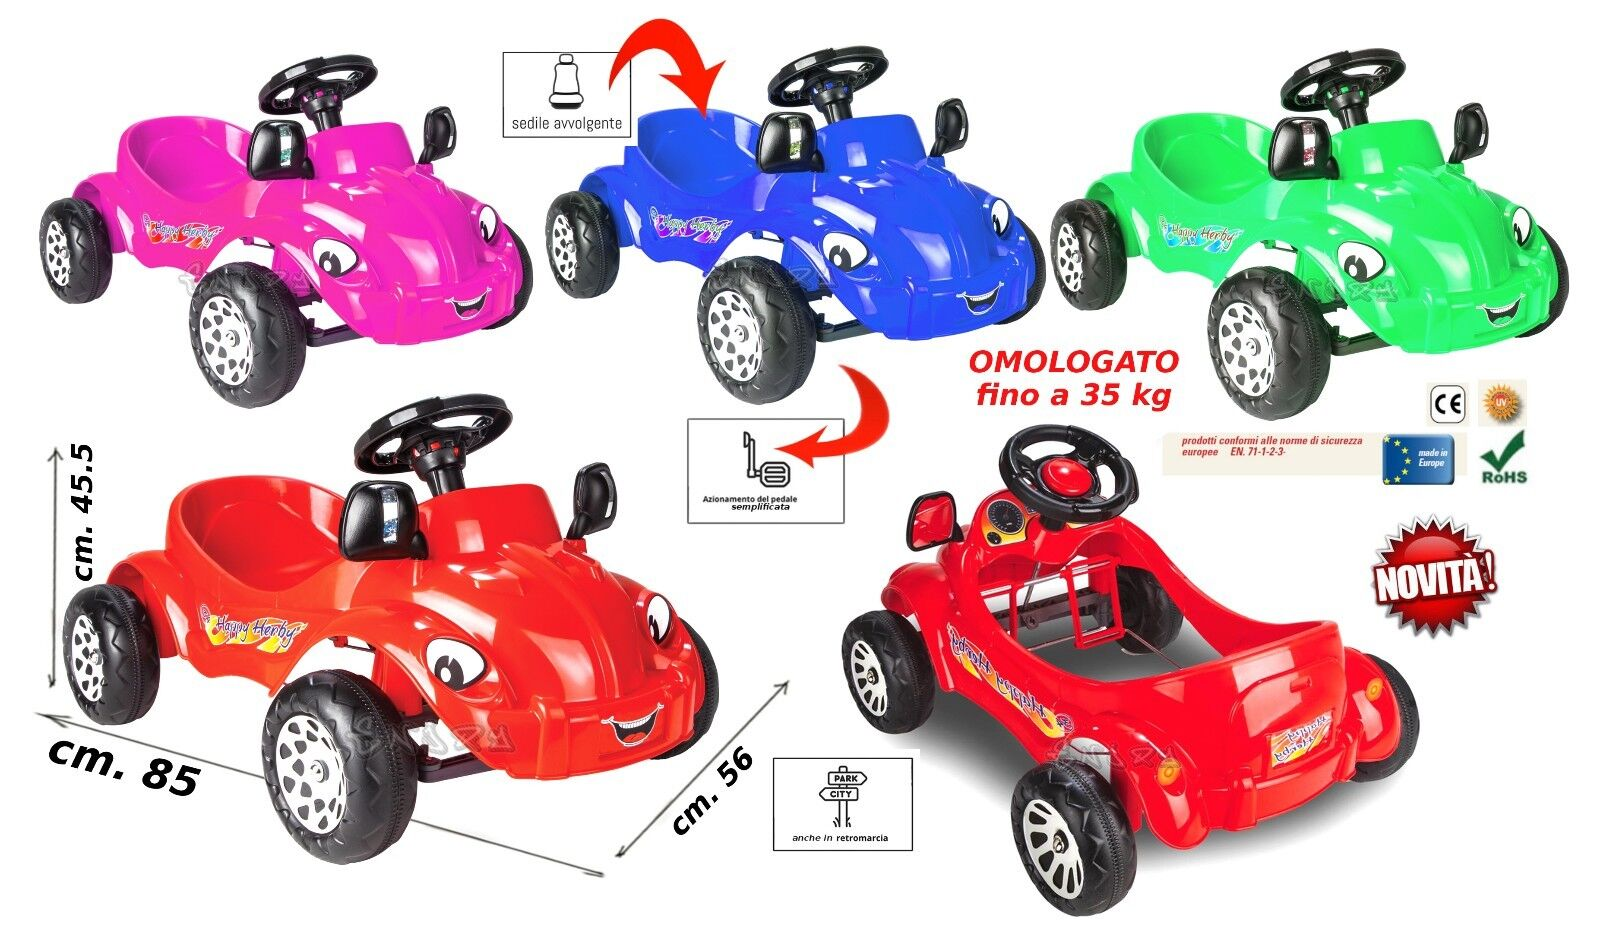 Auto für Kinder A Pedale Maschine Rot Schwimmbare Go Kart A Pedale art.665998